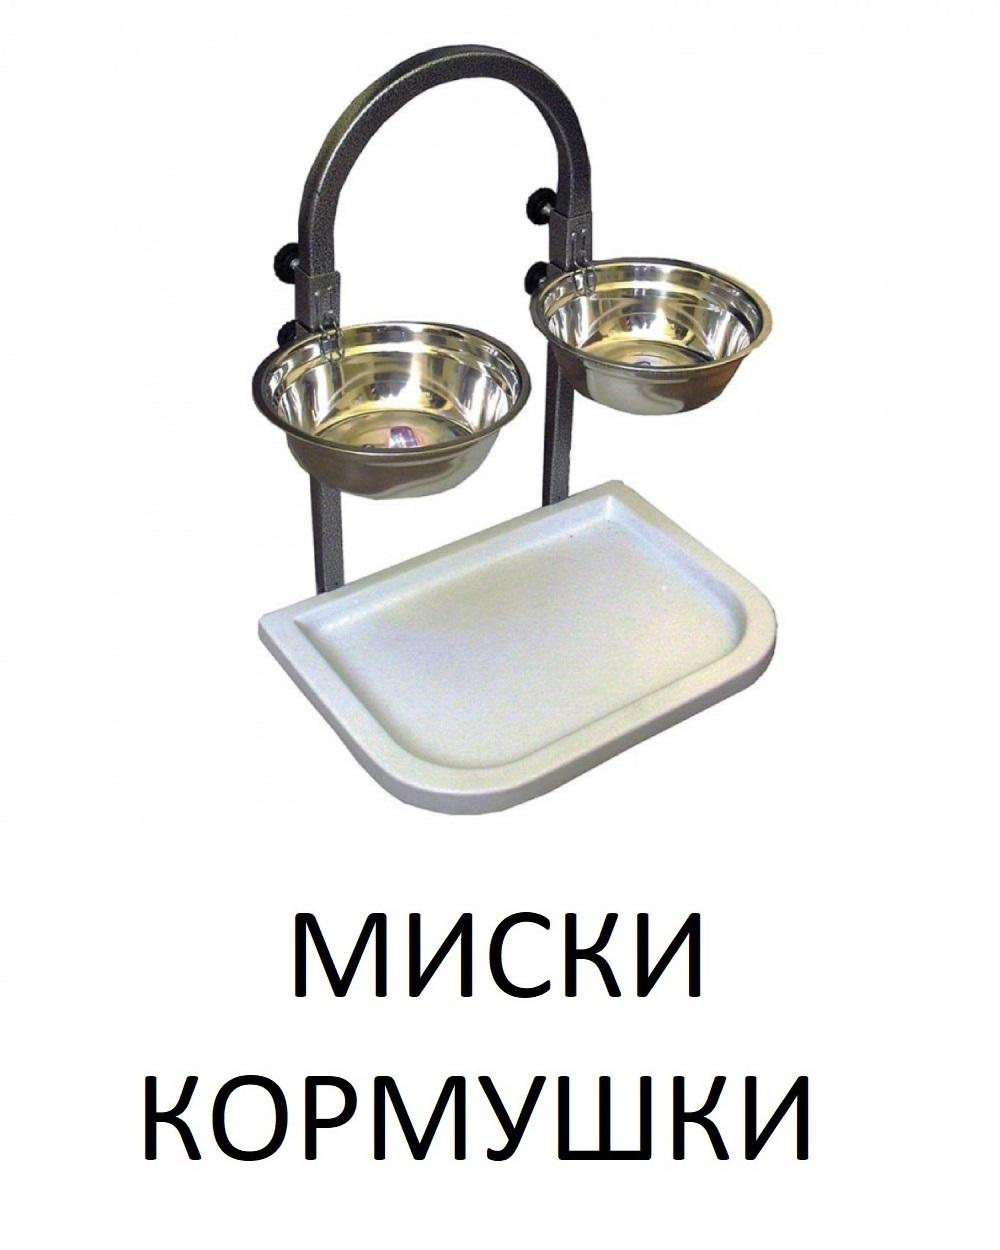 МИСКИ КОРМУШКИ